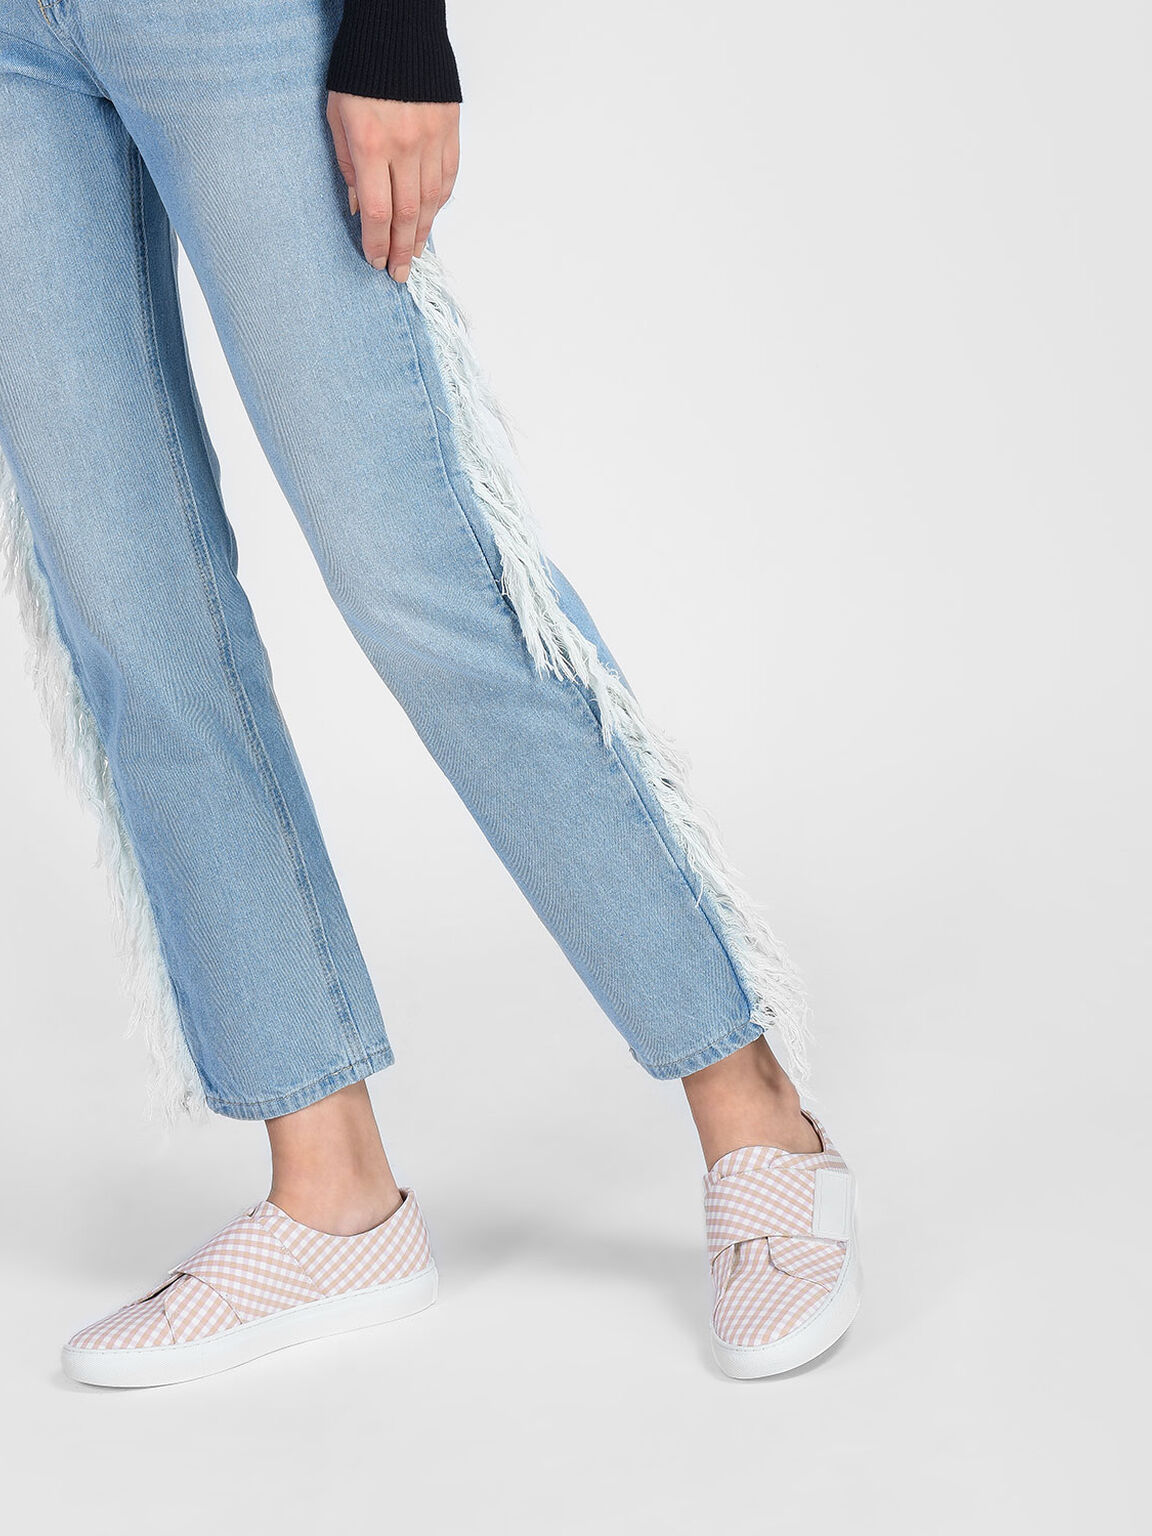 Velcro Sneakers, Pink, hi-res